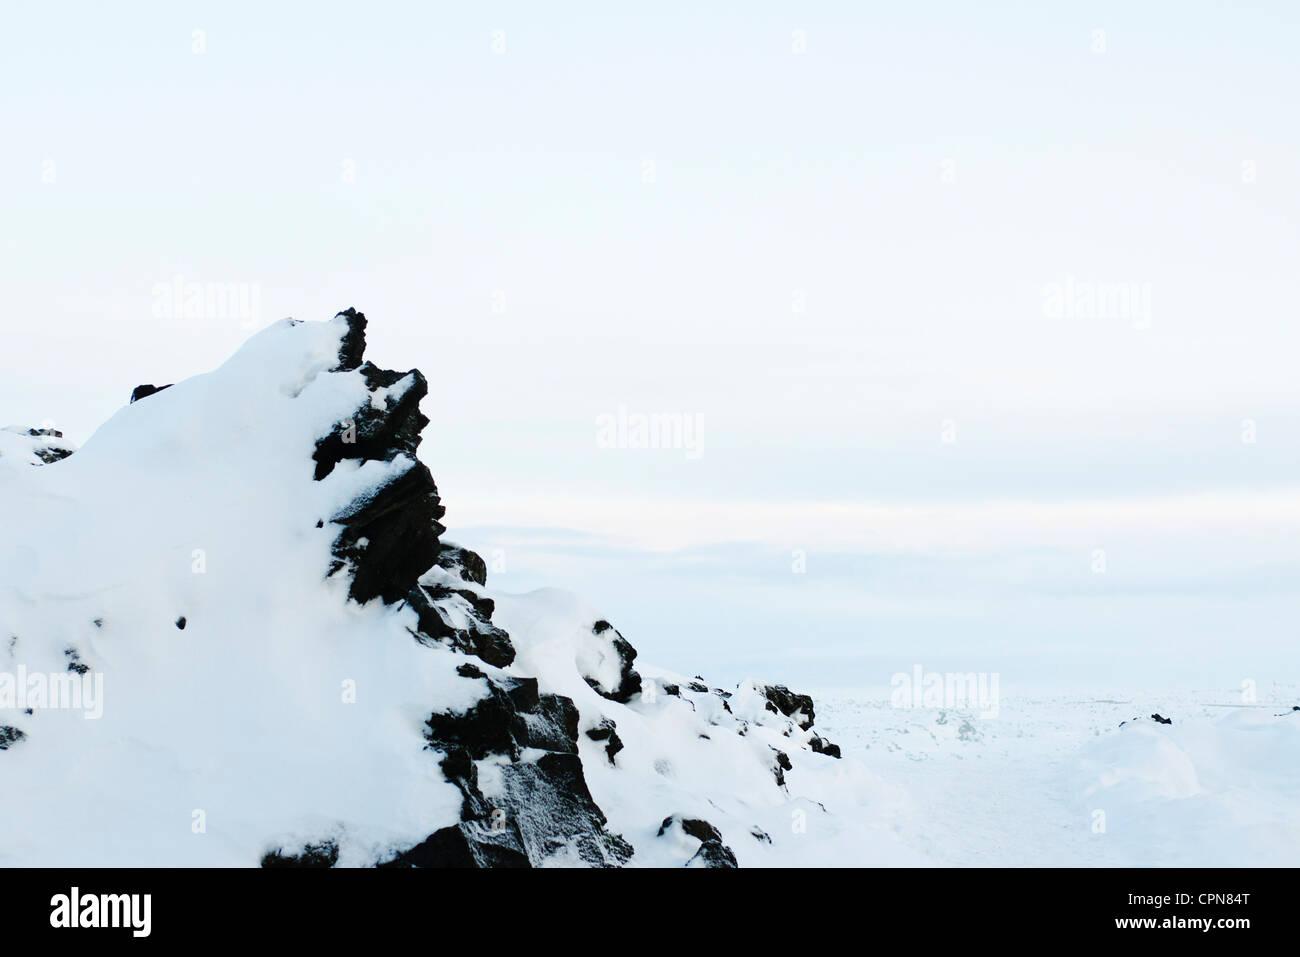 Volcanic rock covered in snow, Reykjanes Peninsula, Iceland - Stock Image